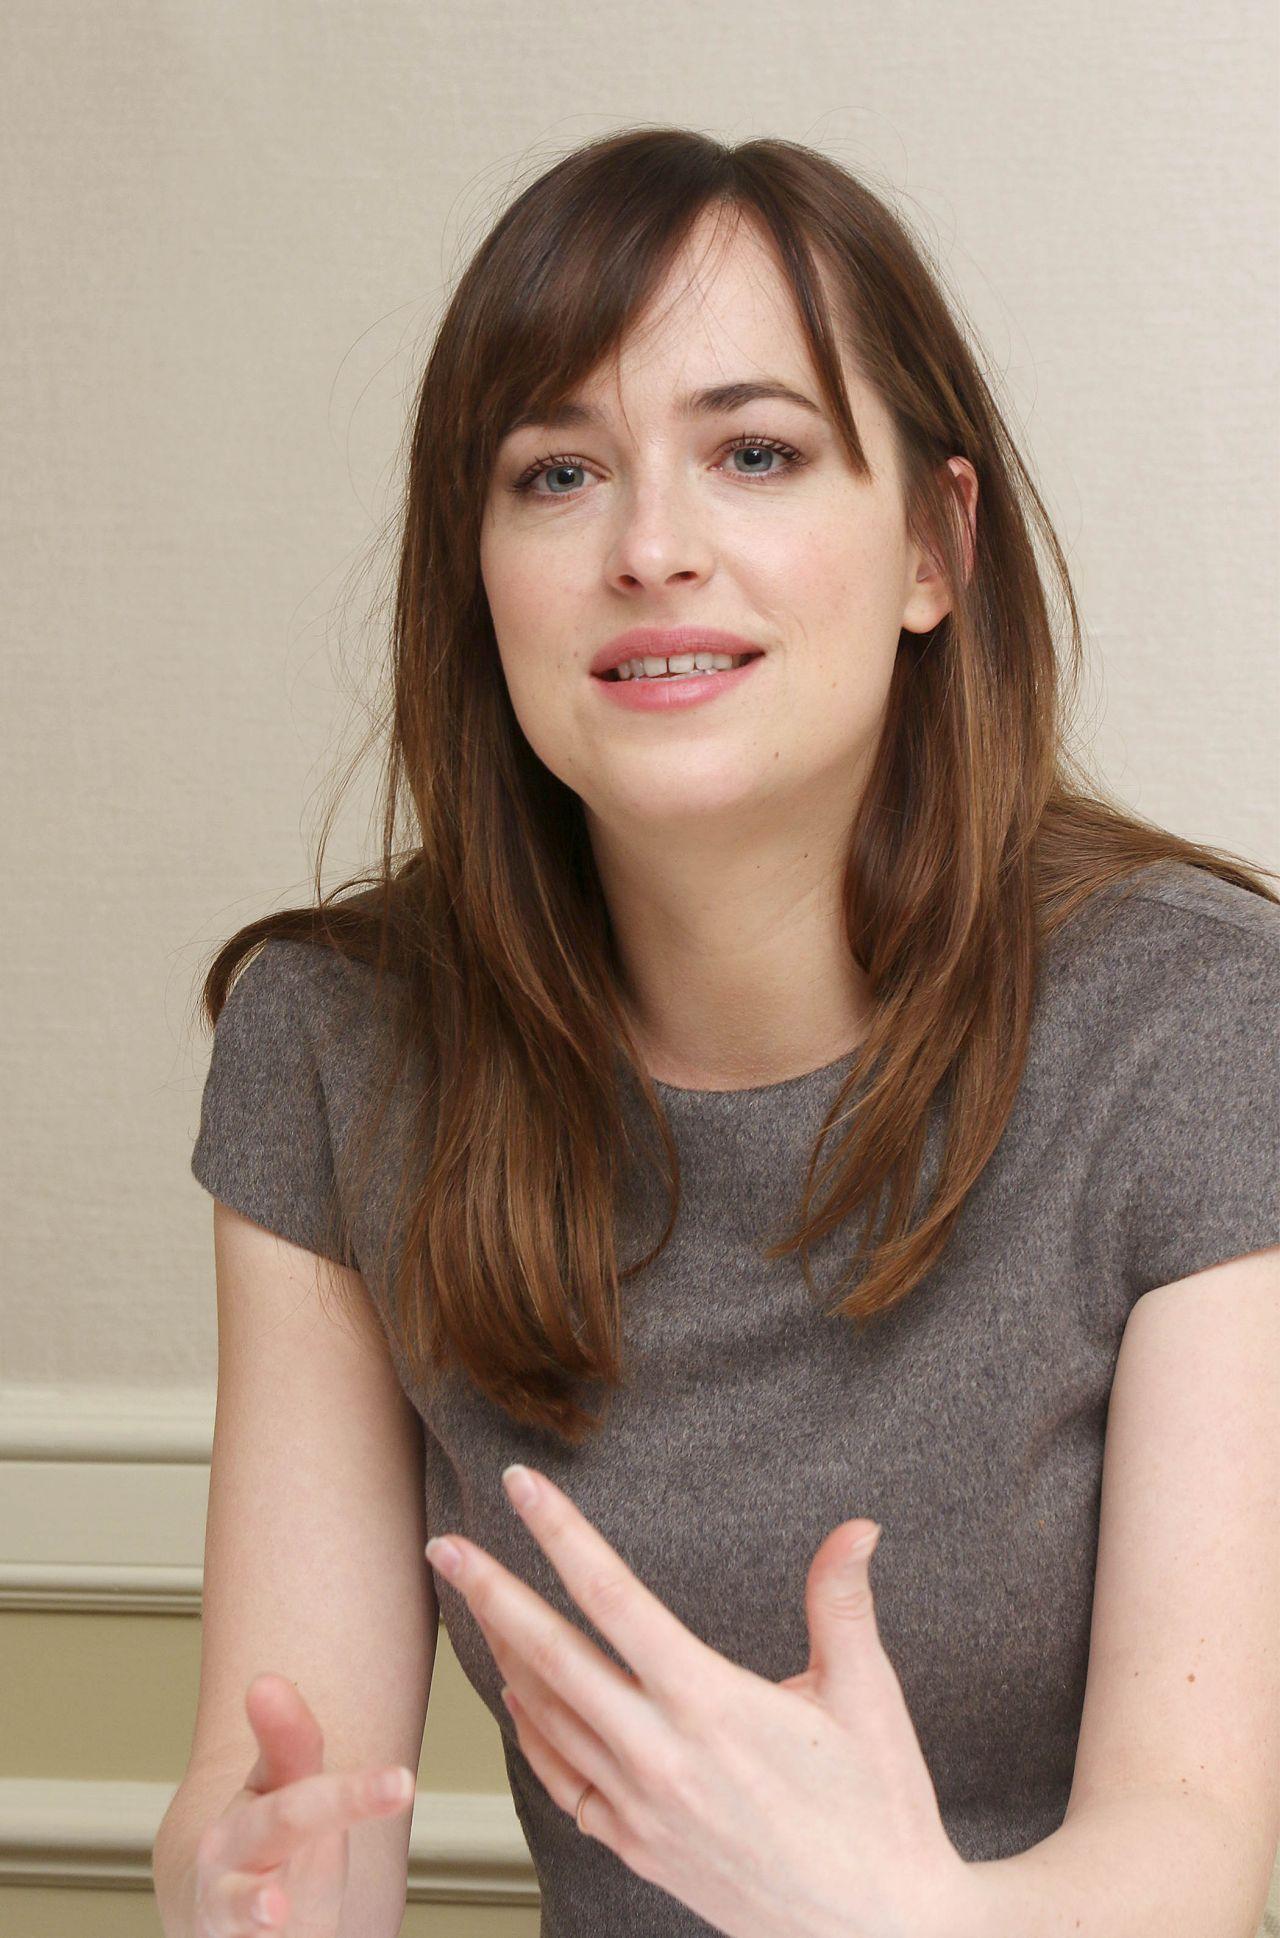 Dakota Johnson Fifty Shades Of Grey Press Conference